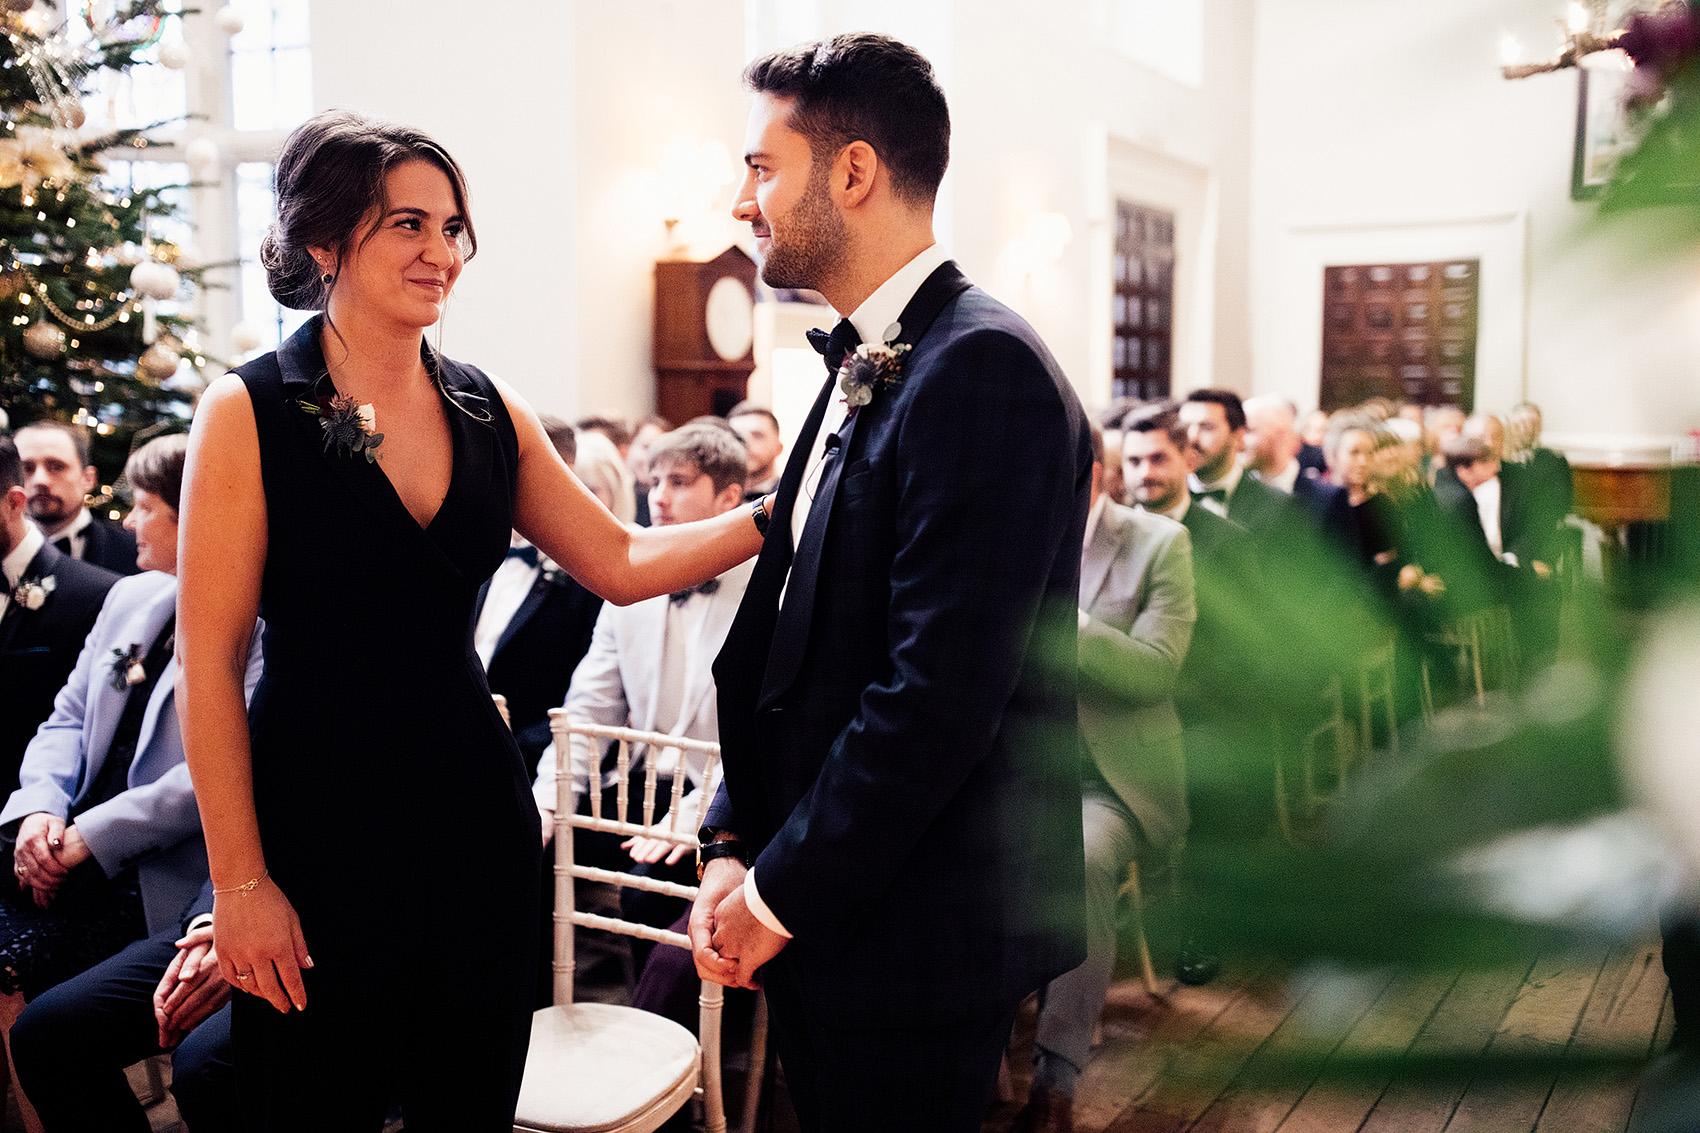 elmore-court-wedding-photography-26.jpg